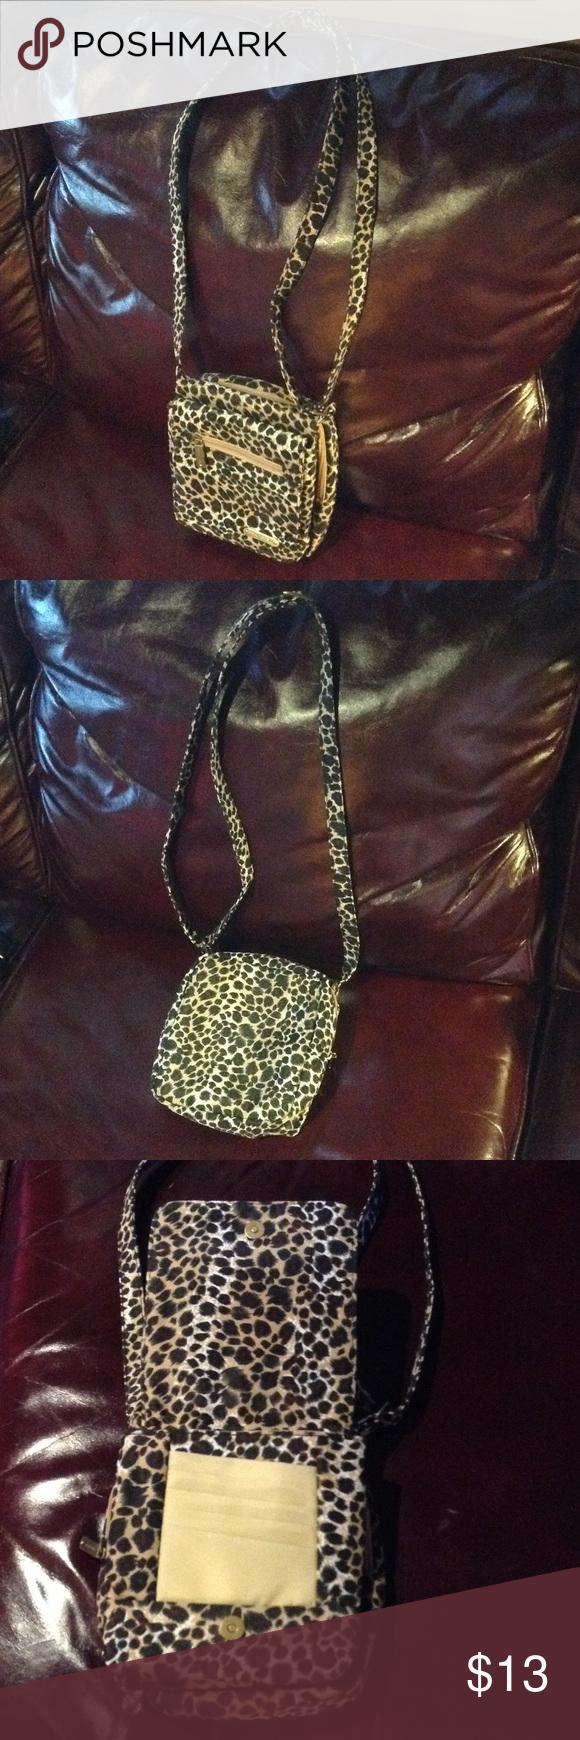 Travelon Brand Patterned Crossbody Bag Travelon brand. Crossbody bag. Adjustable strap. Tan, black, white, brown. Cute. Clean. No issues. Cute bag! Travelon Bags Crossbody Bags